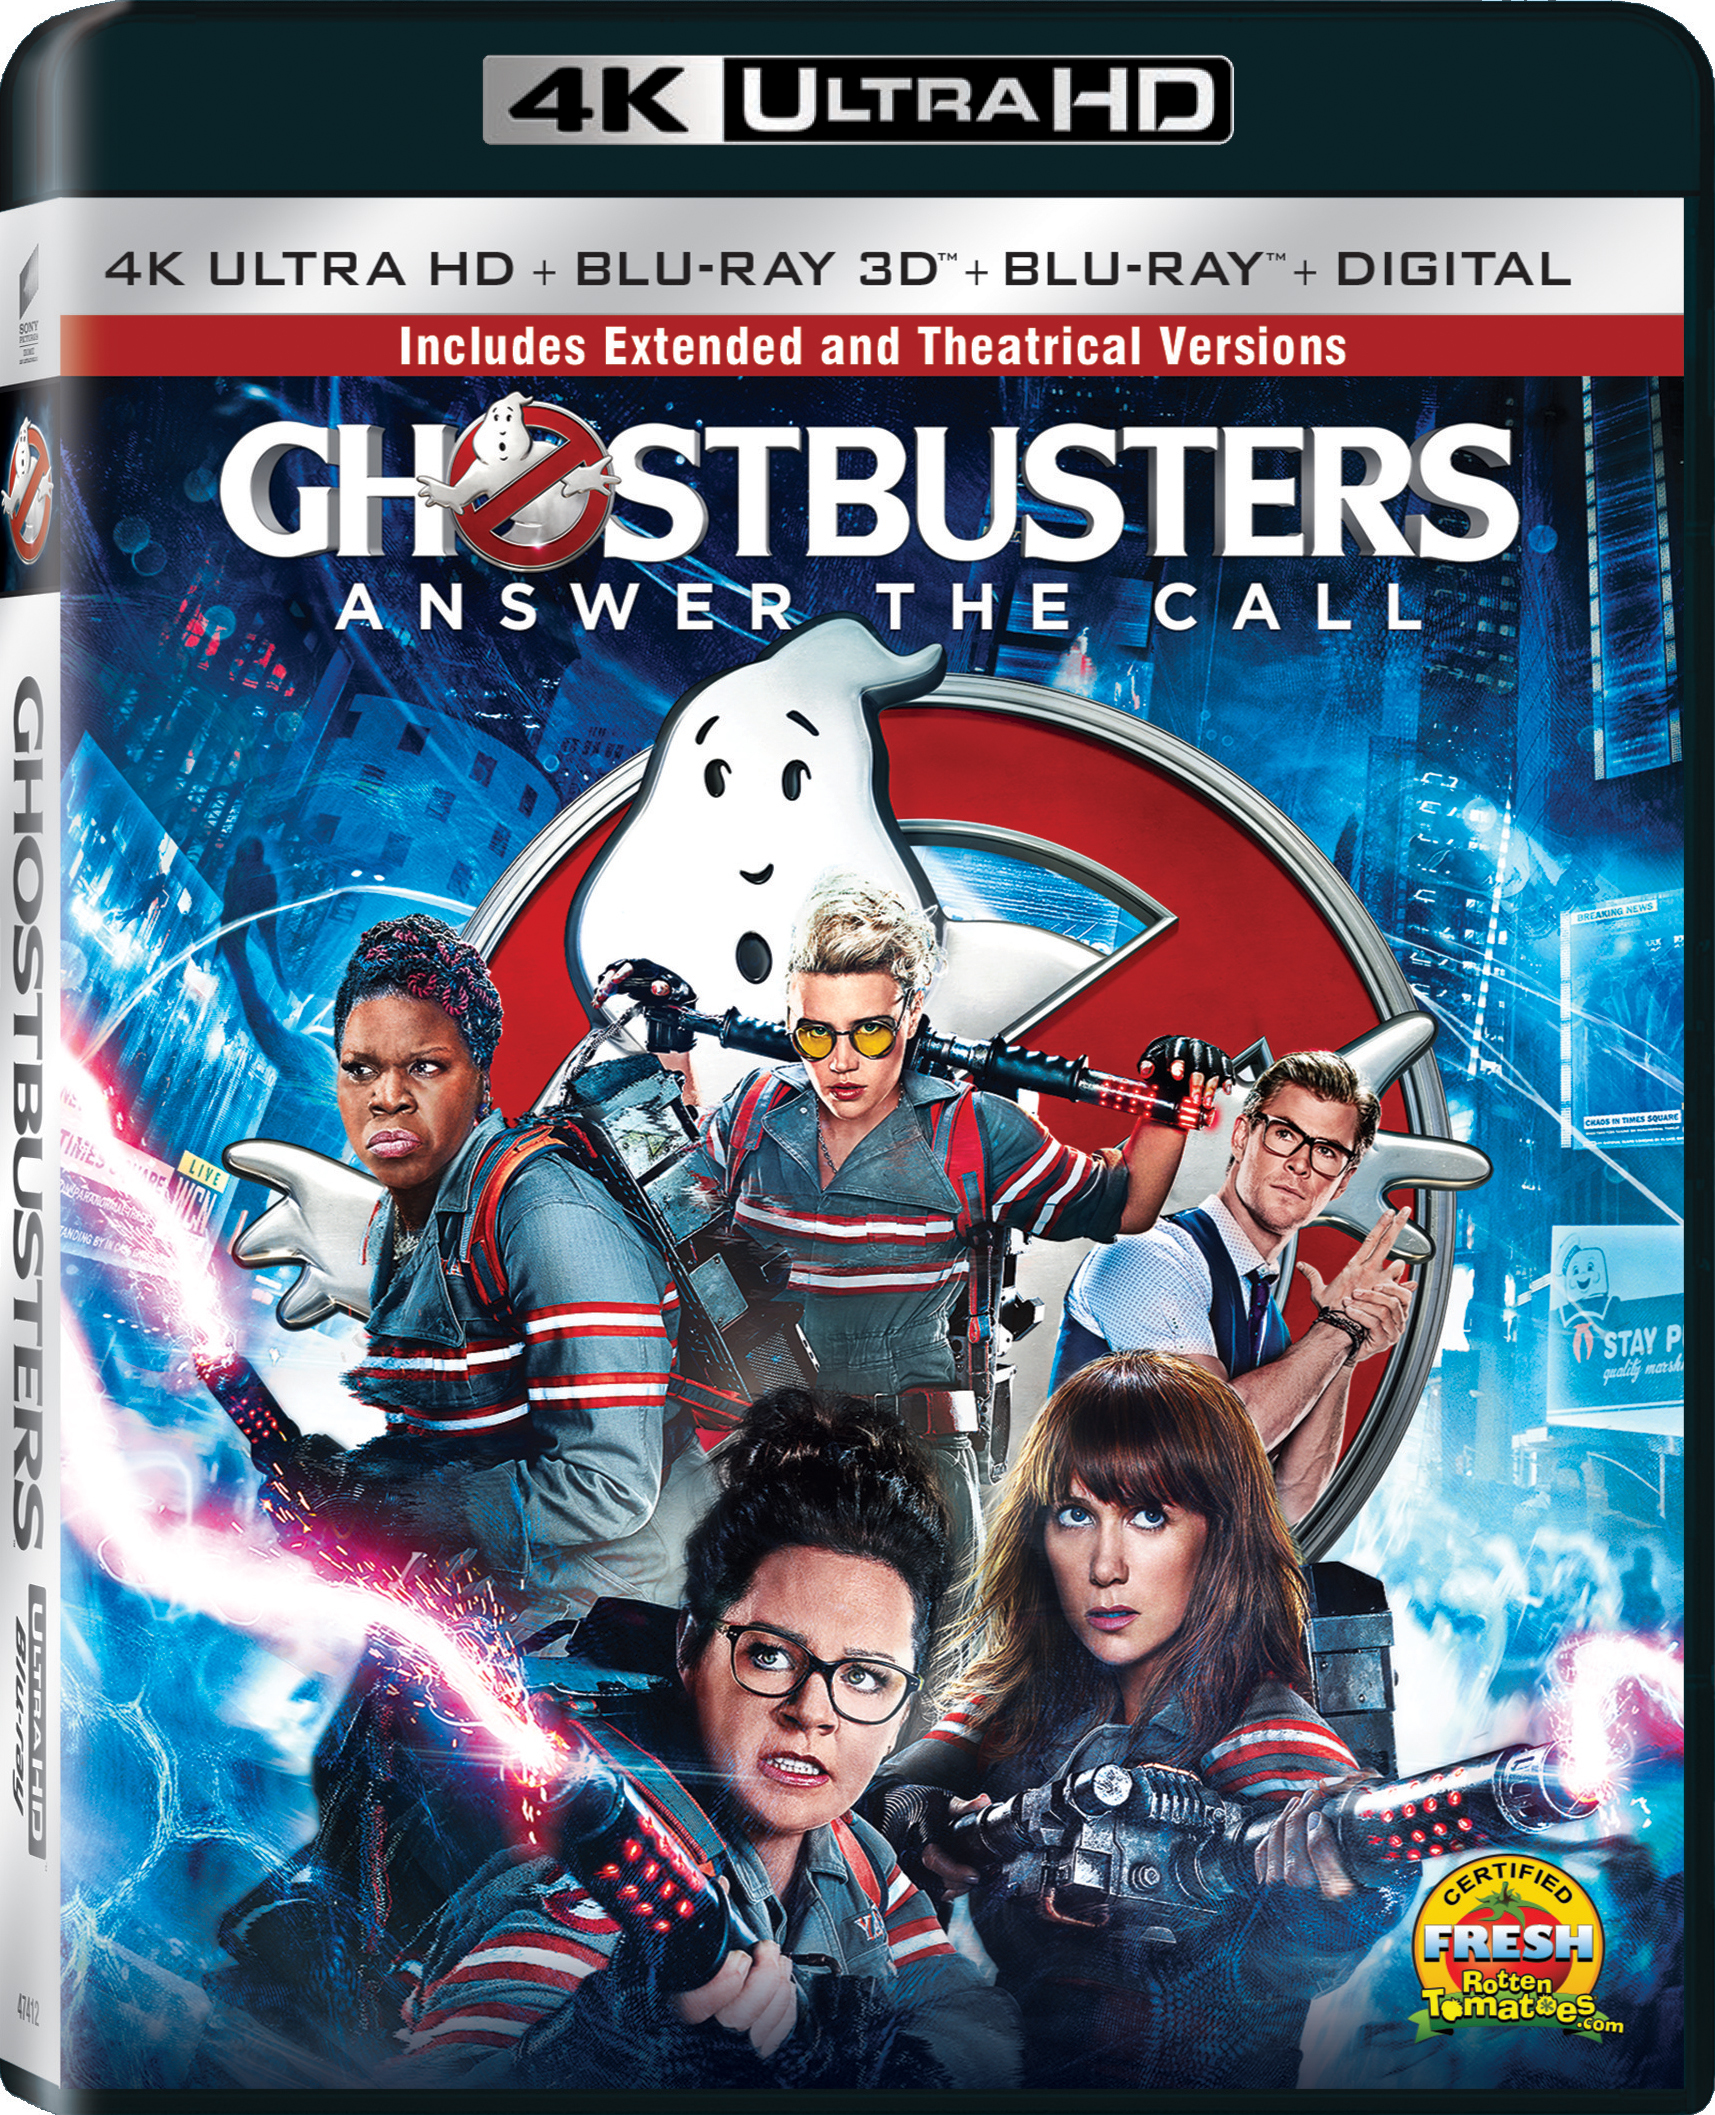 Ghostbusters (2016) 4K Ultra HD Blu-ray